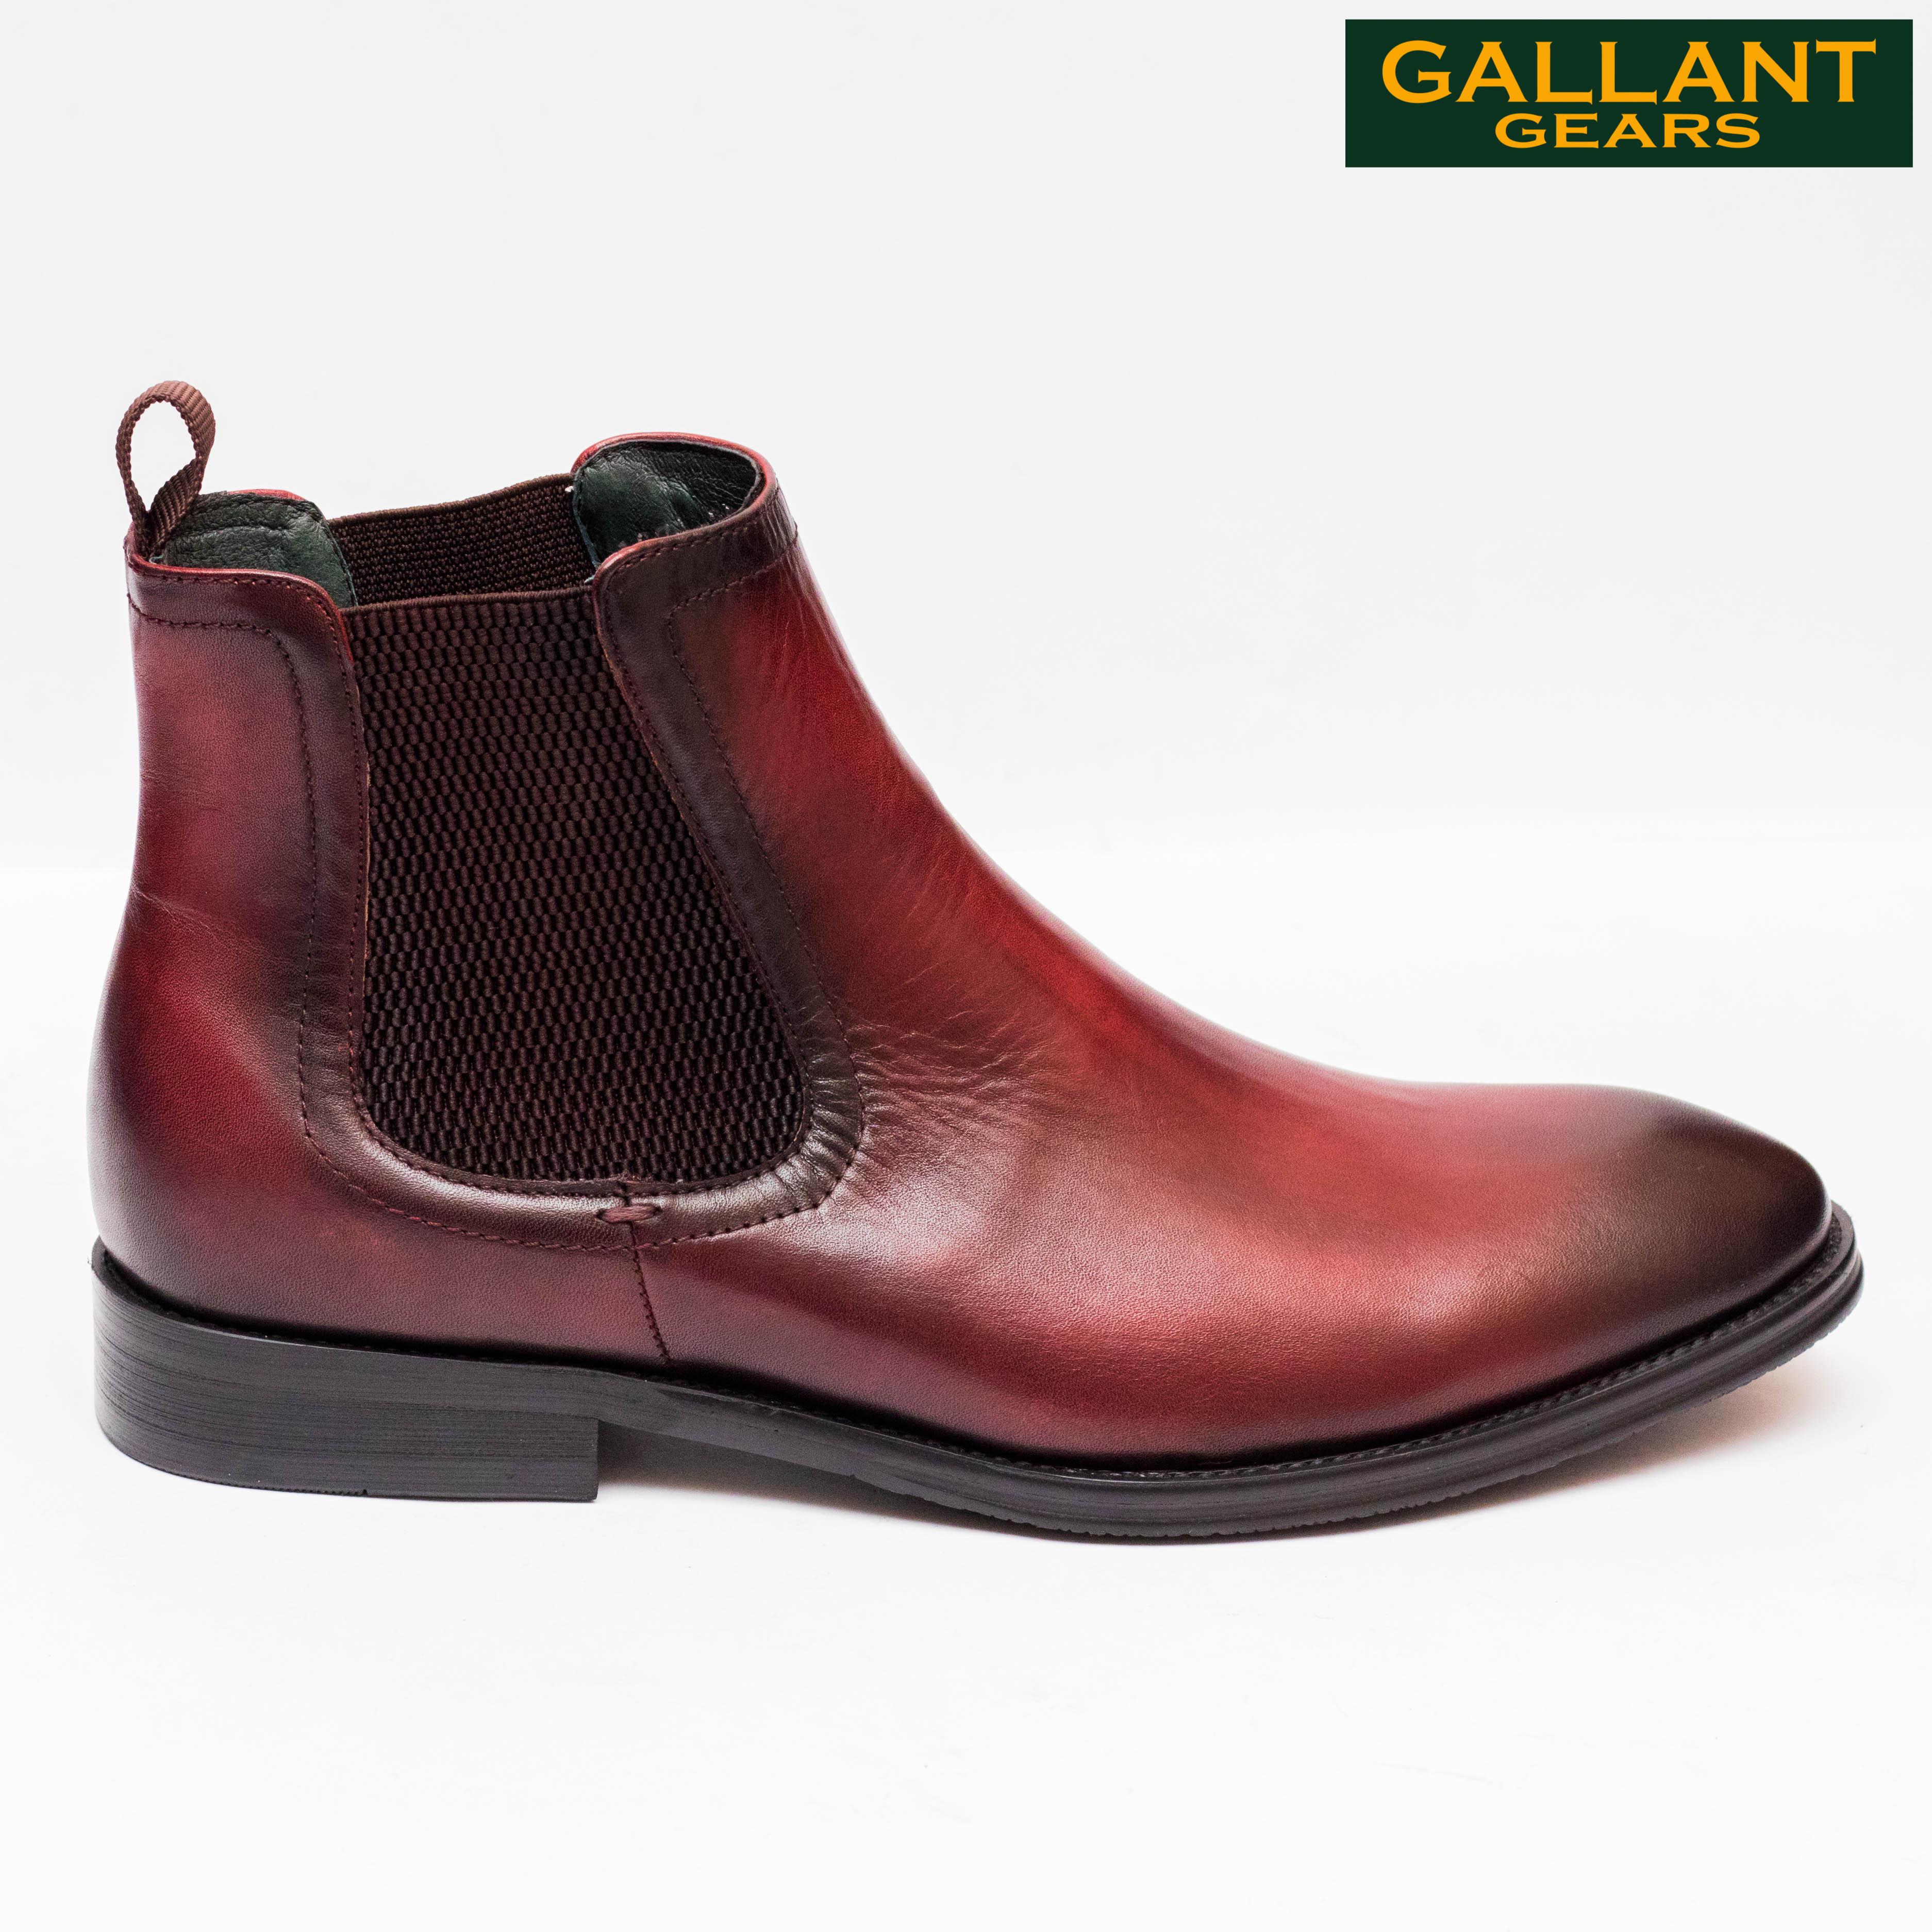 Kapadaa: Gallant Gears Wine Red Leather